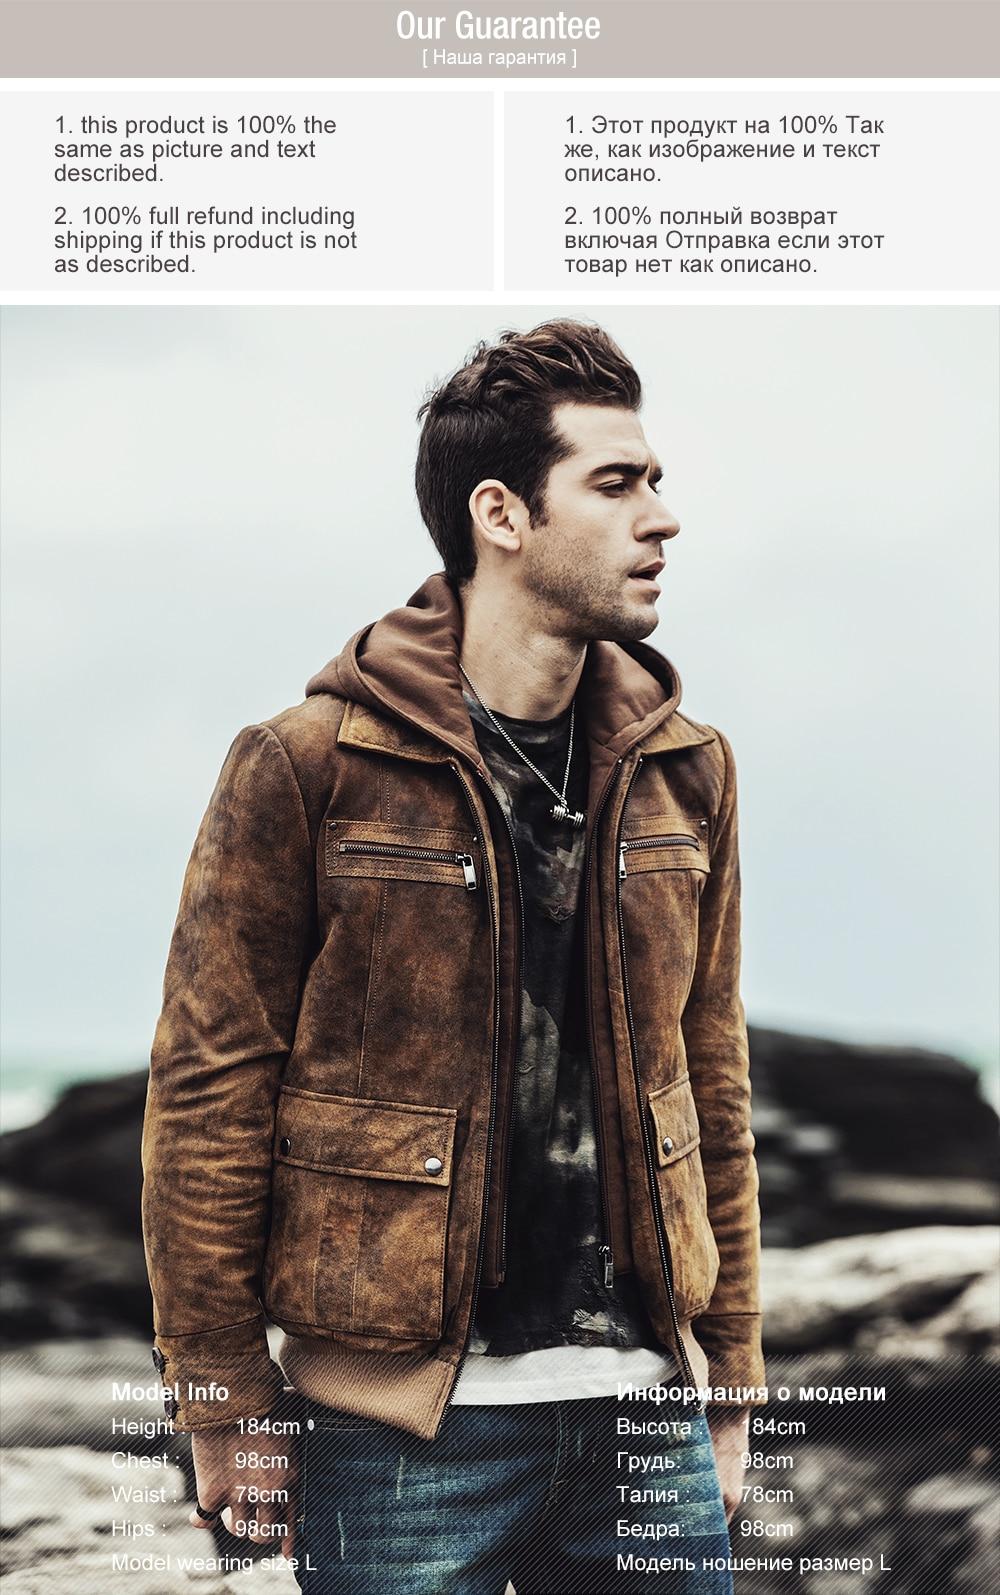 H616a663aa5bb4a21a922797d45aca8e3U 2017 NEW Men's Retro Autumn Winter warm Coat Real leather Motorcycle jacket Detachable Hooded Male Genuine Leather Jacket